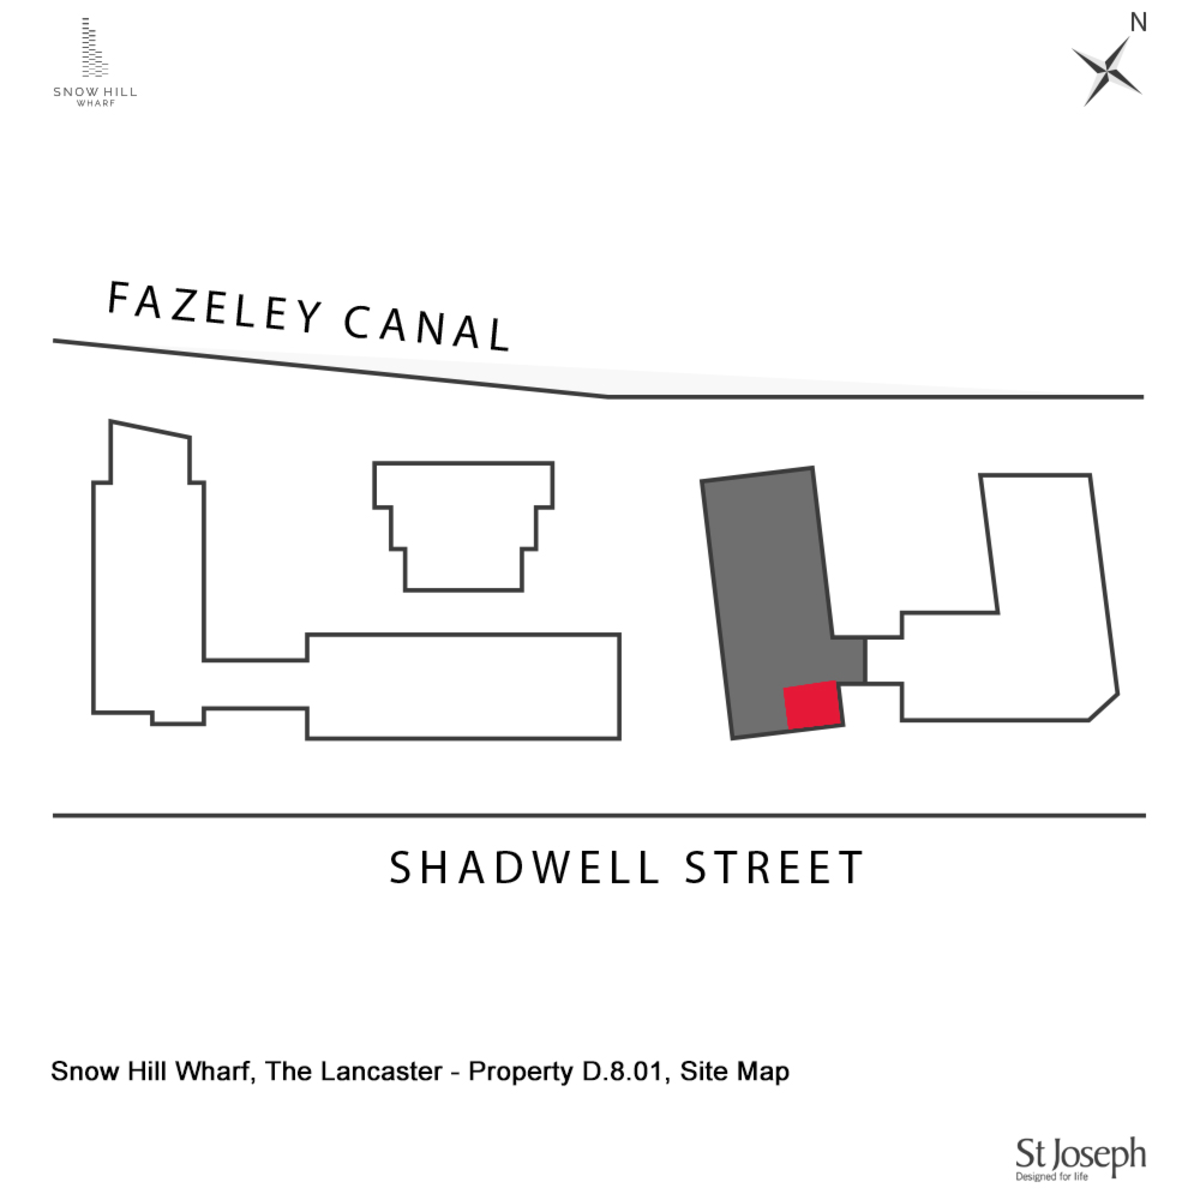 Snow Hill Wharf, Birmingham City Centre floorplan 3 of 3